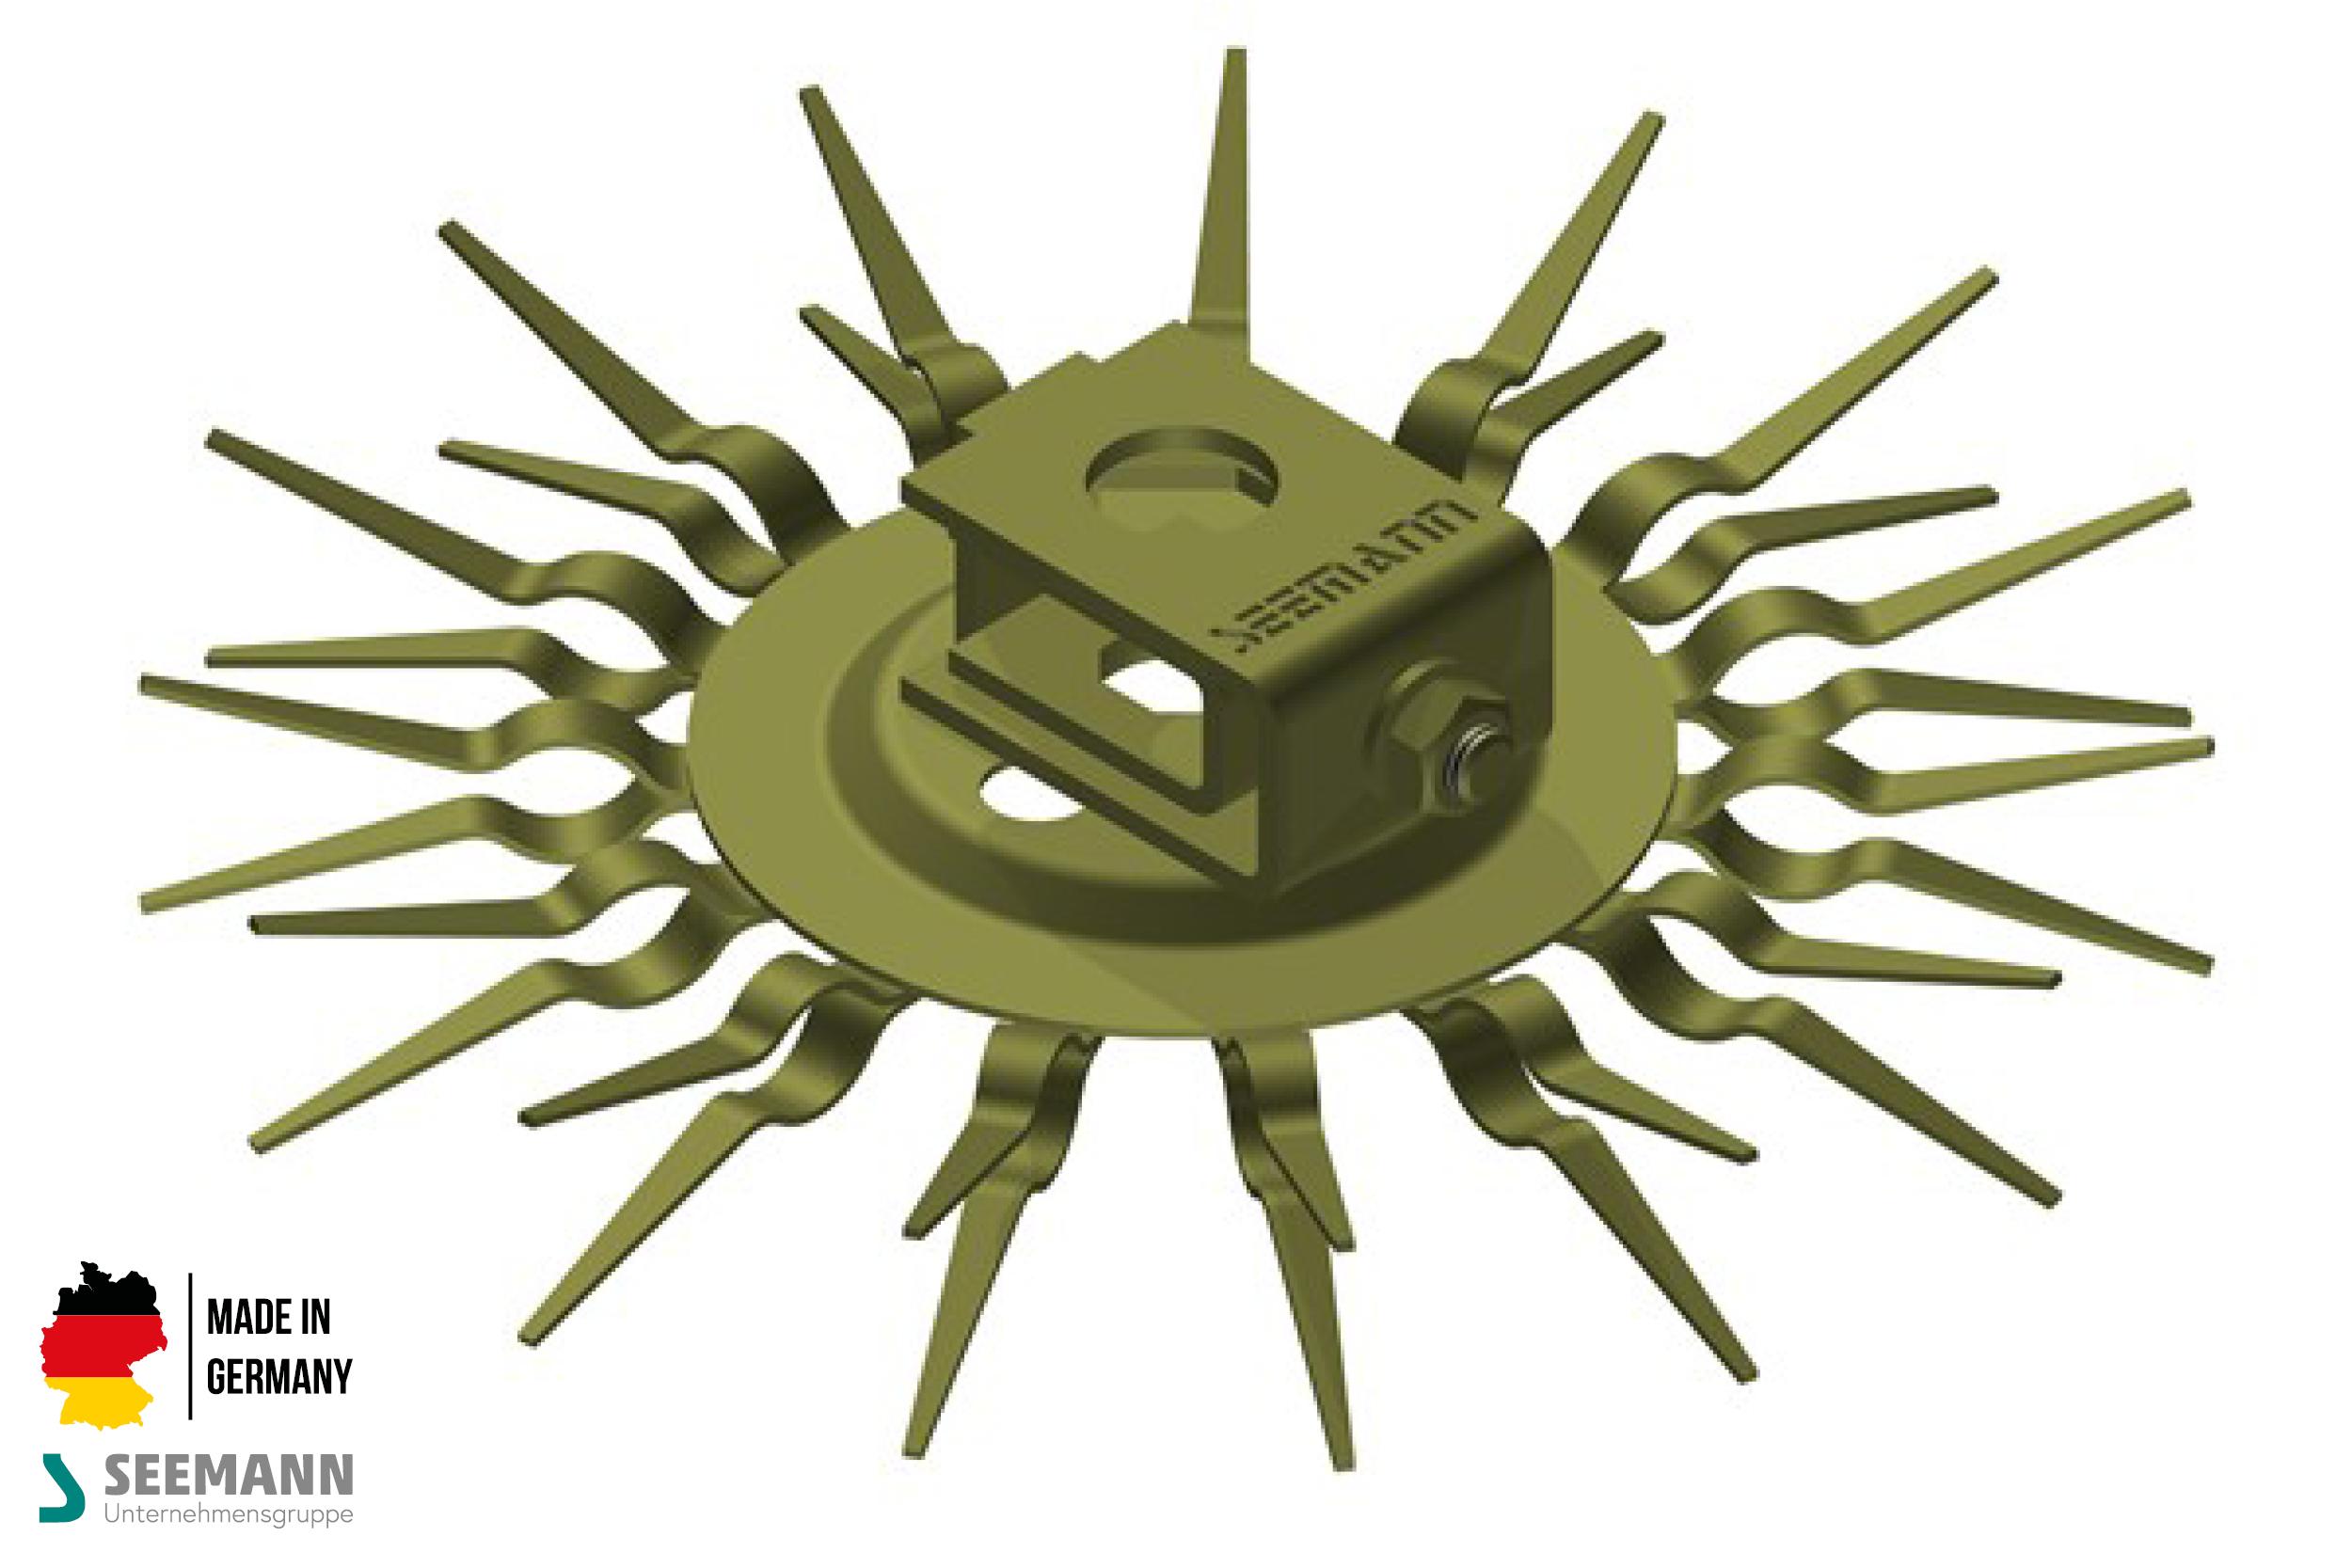 Titan-Klammerteller mit 15 Kontakten